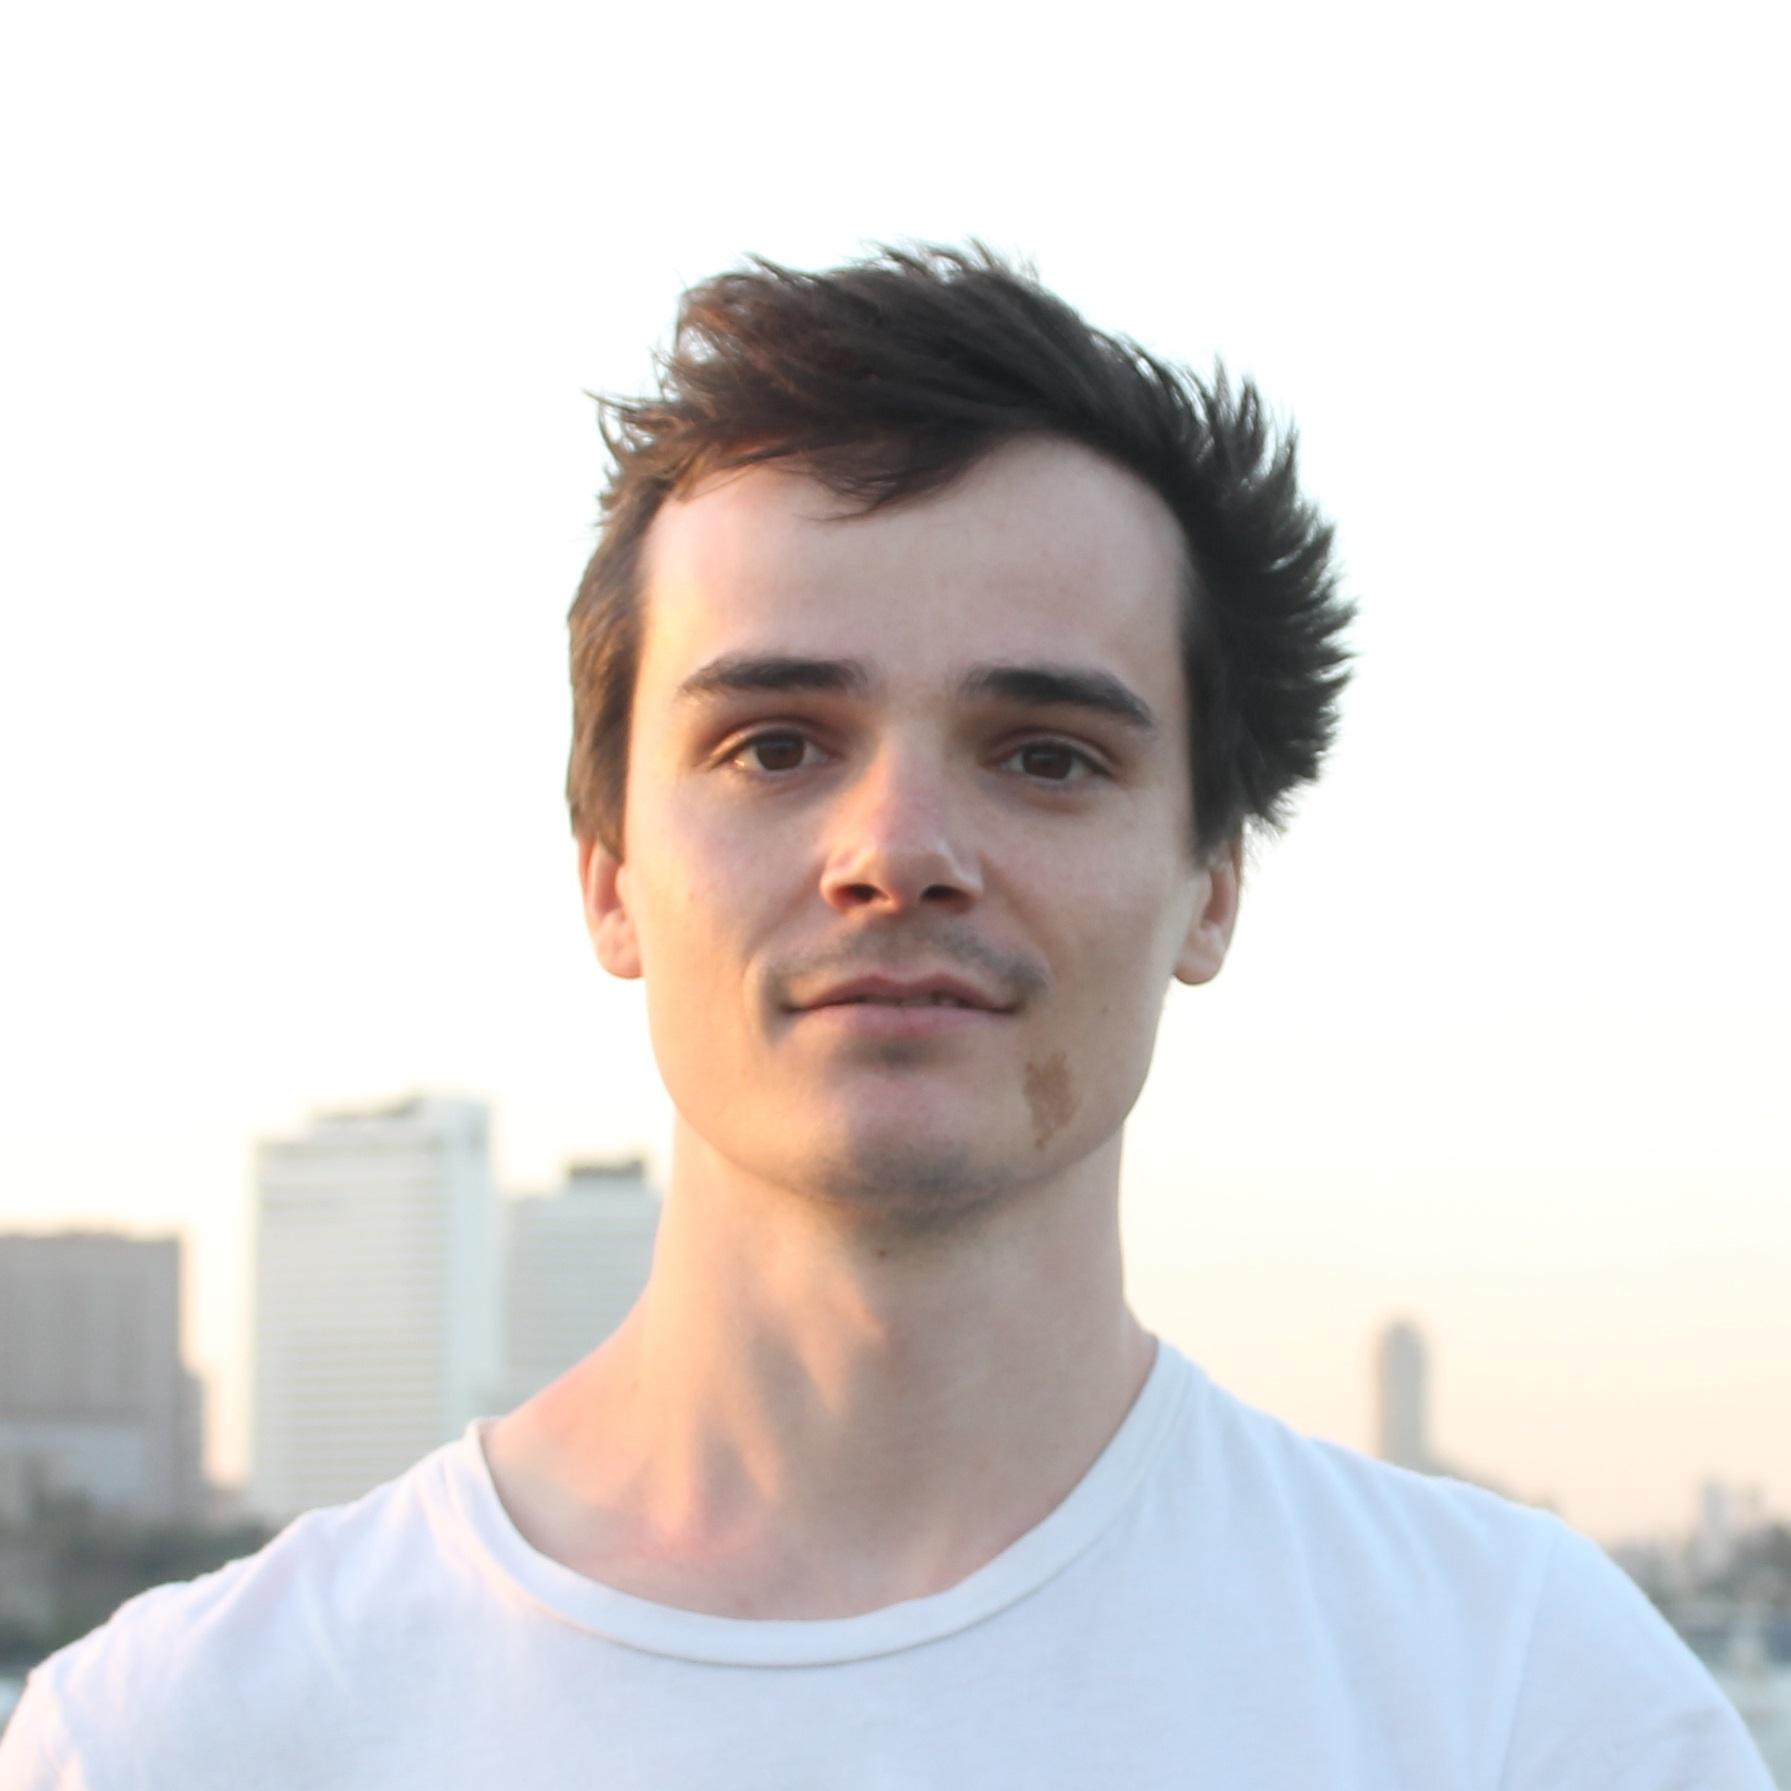 Dominik Kodlin - Board Member, Co-founder, Finances